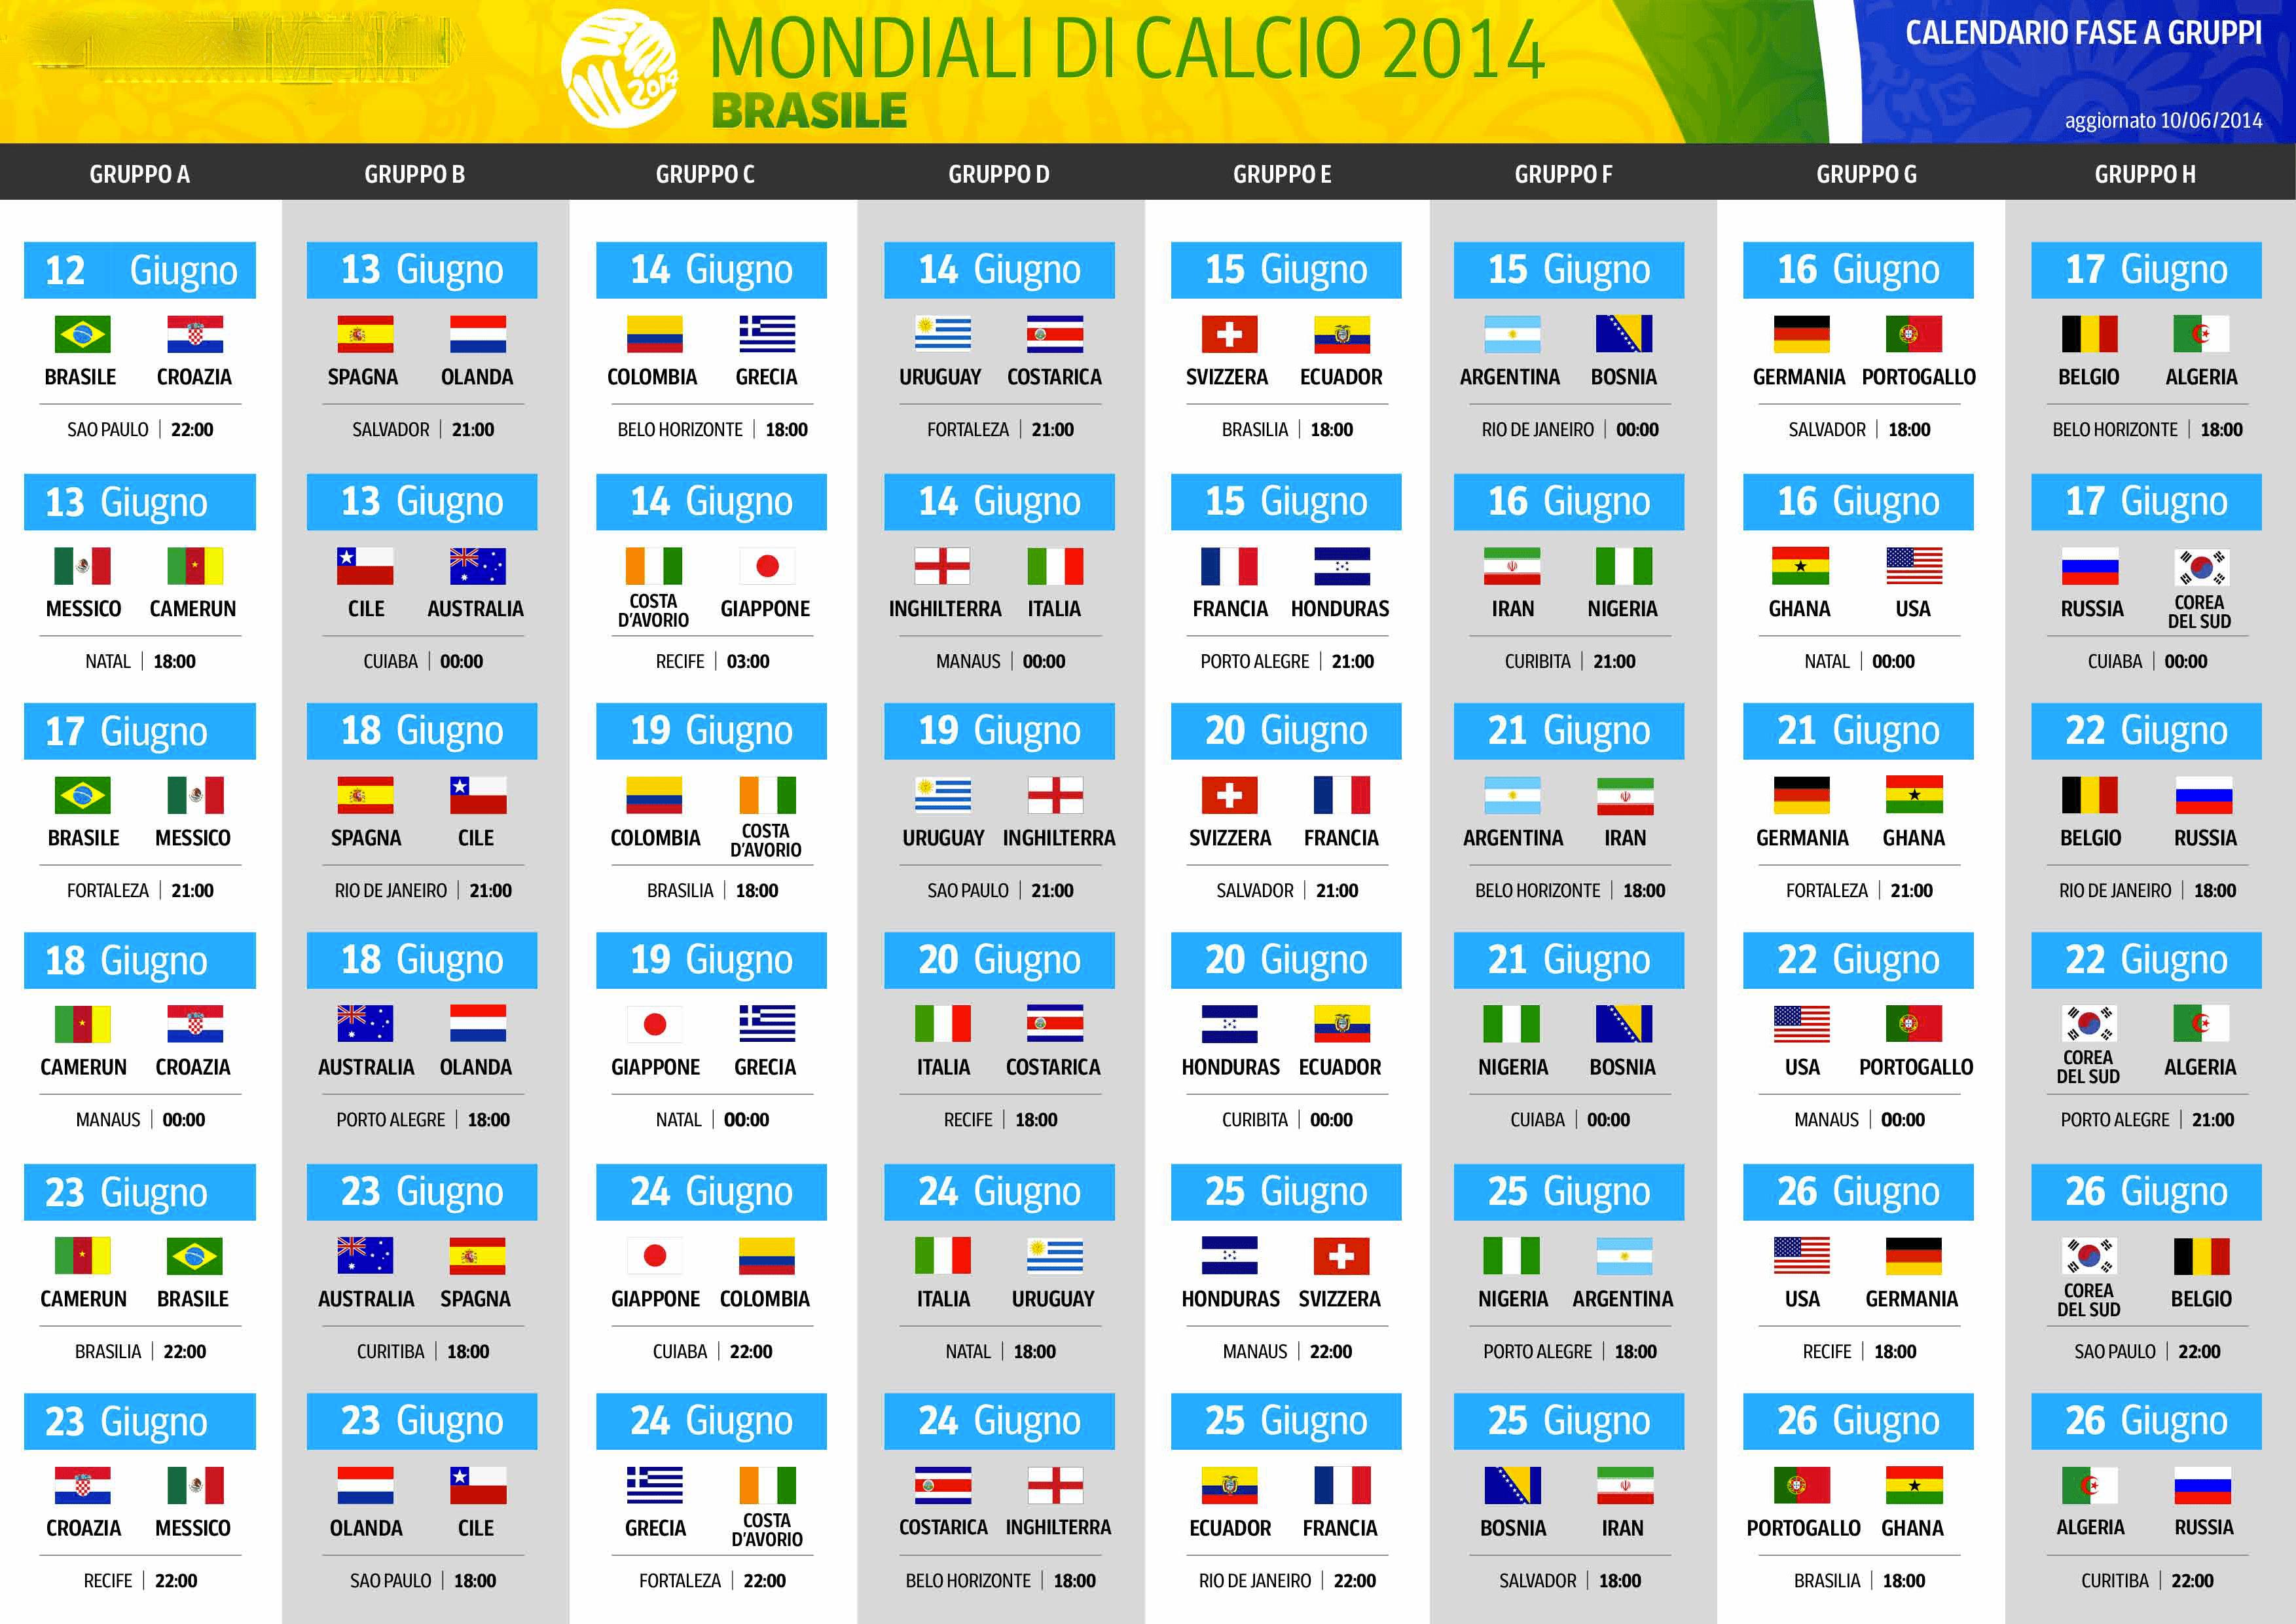 Mondiale Calendario.Mondiale Brasile 2014 Il Calendario Tabellone Date E